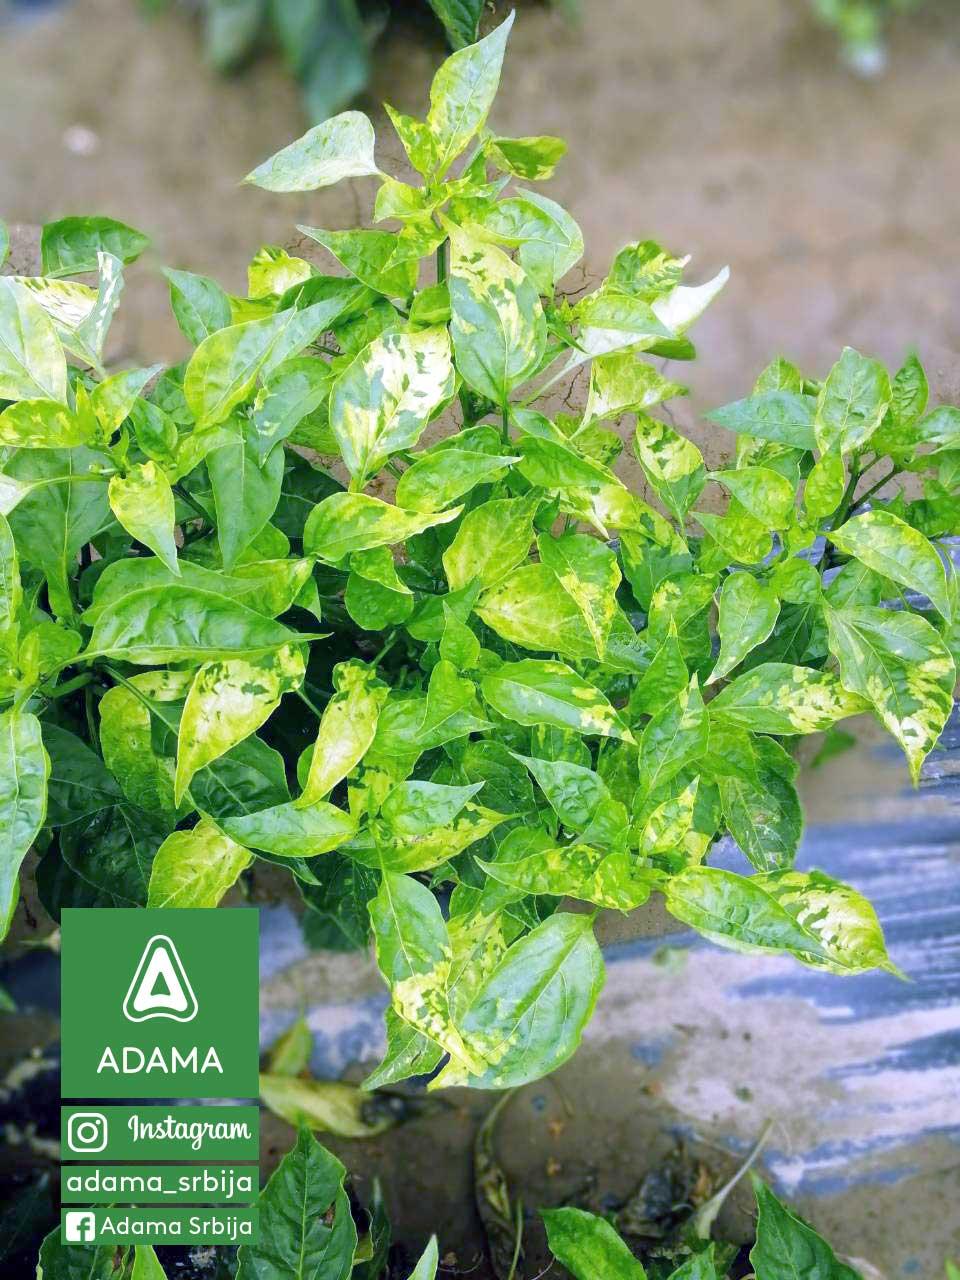 Agrosaveti---Adama---Povce---Paprika---Virusi